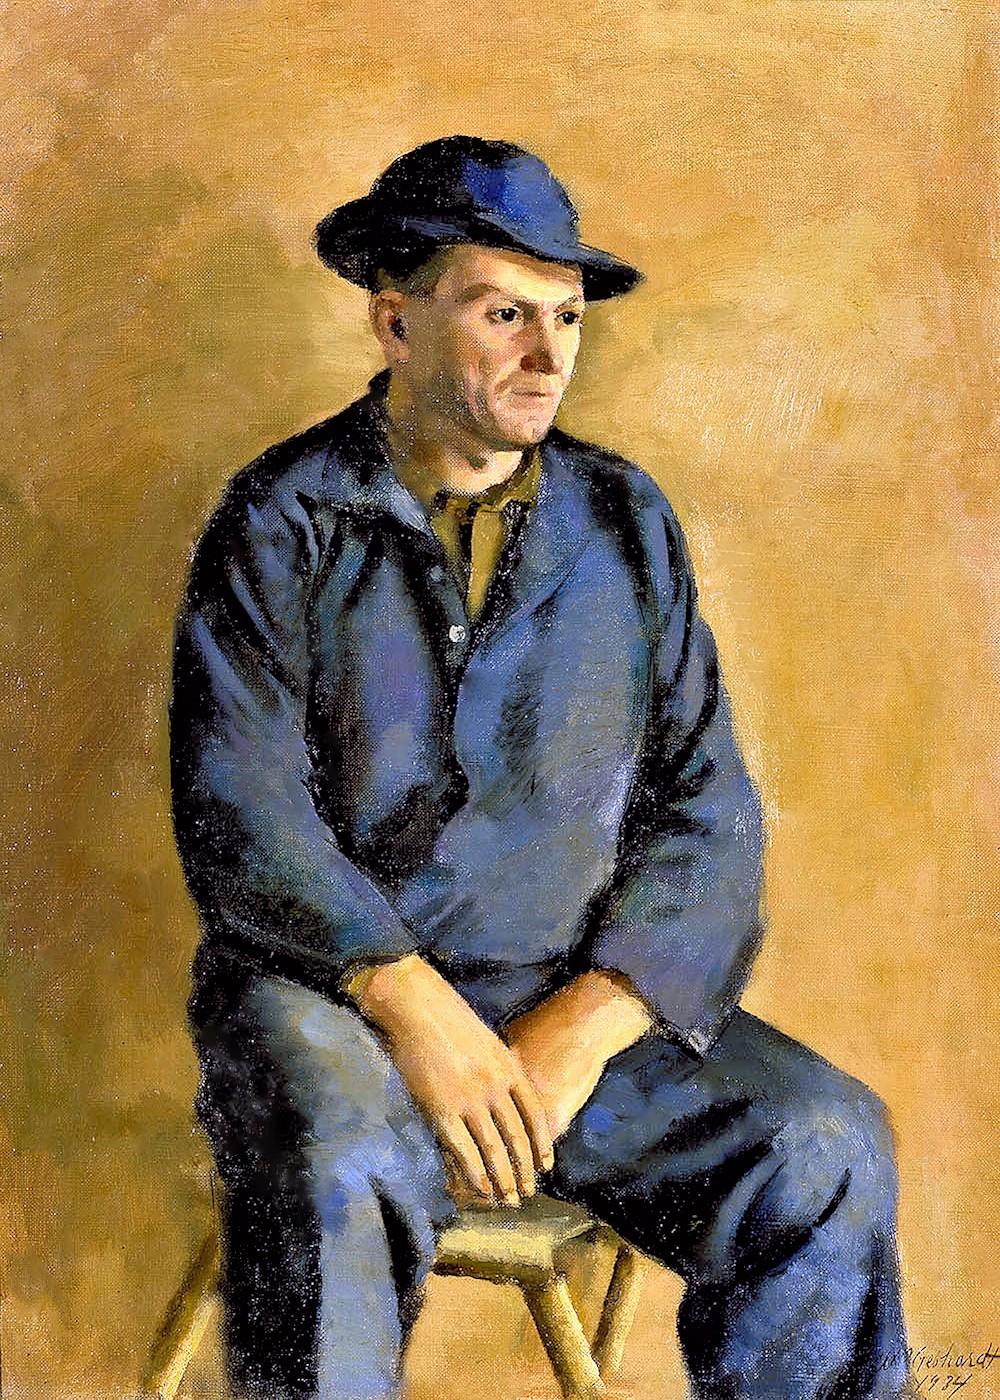 00 William Gebhardt. Joseph Roy, Portrait of a Worker. 1934